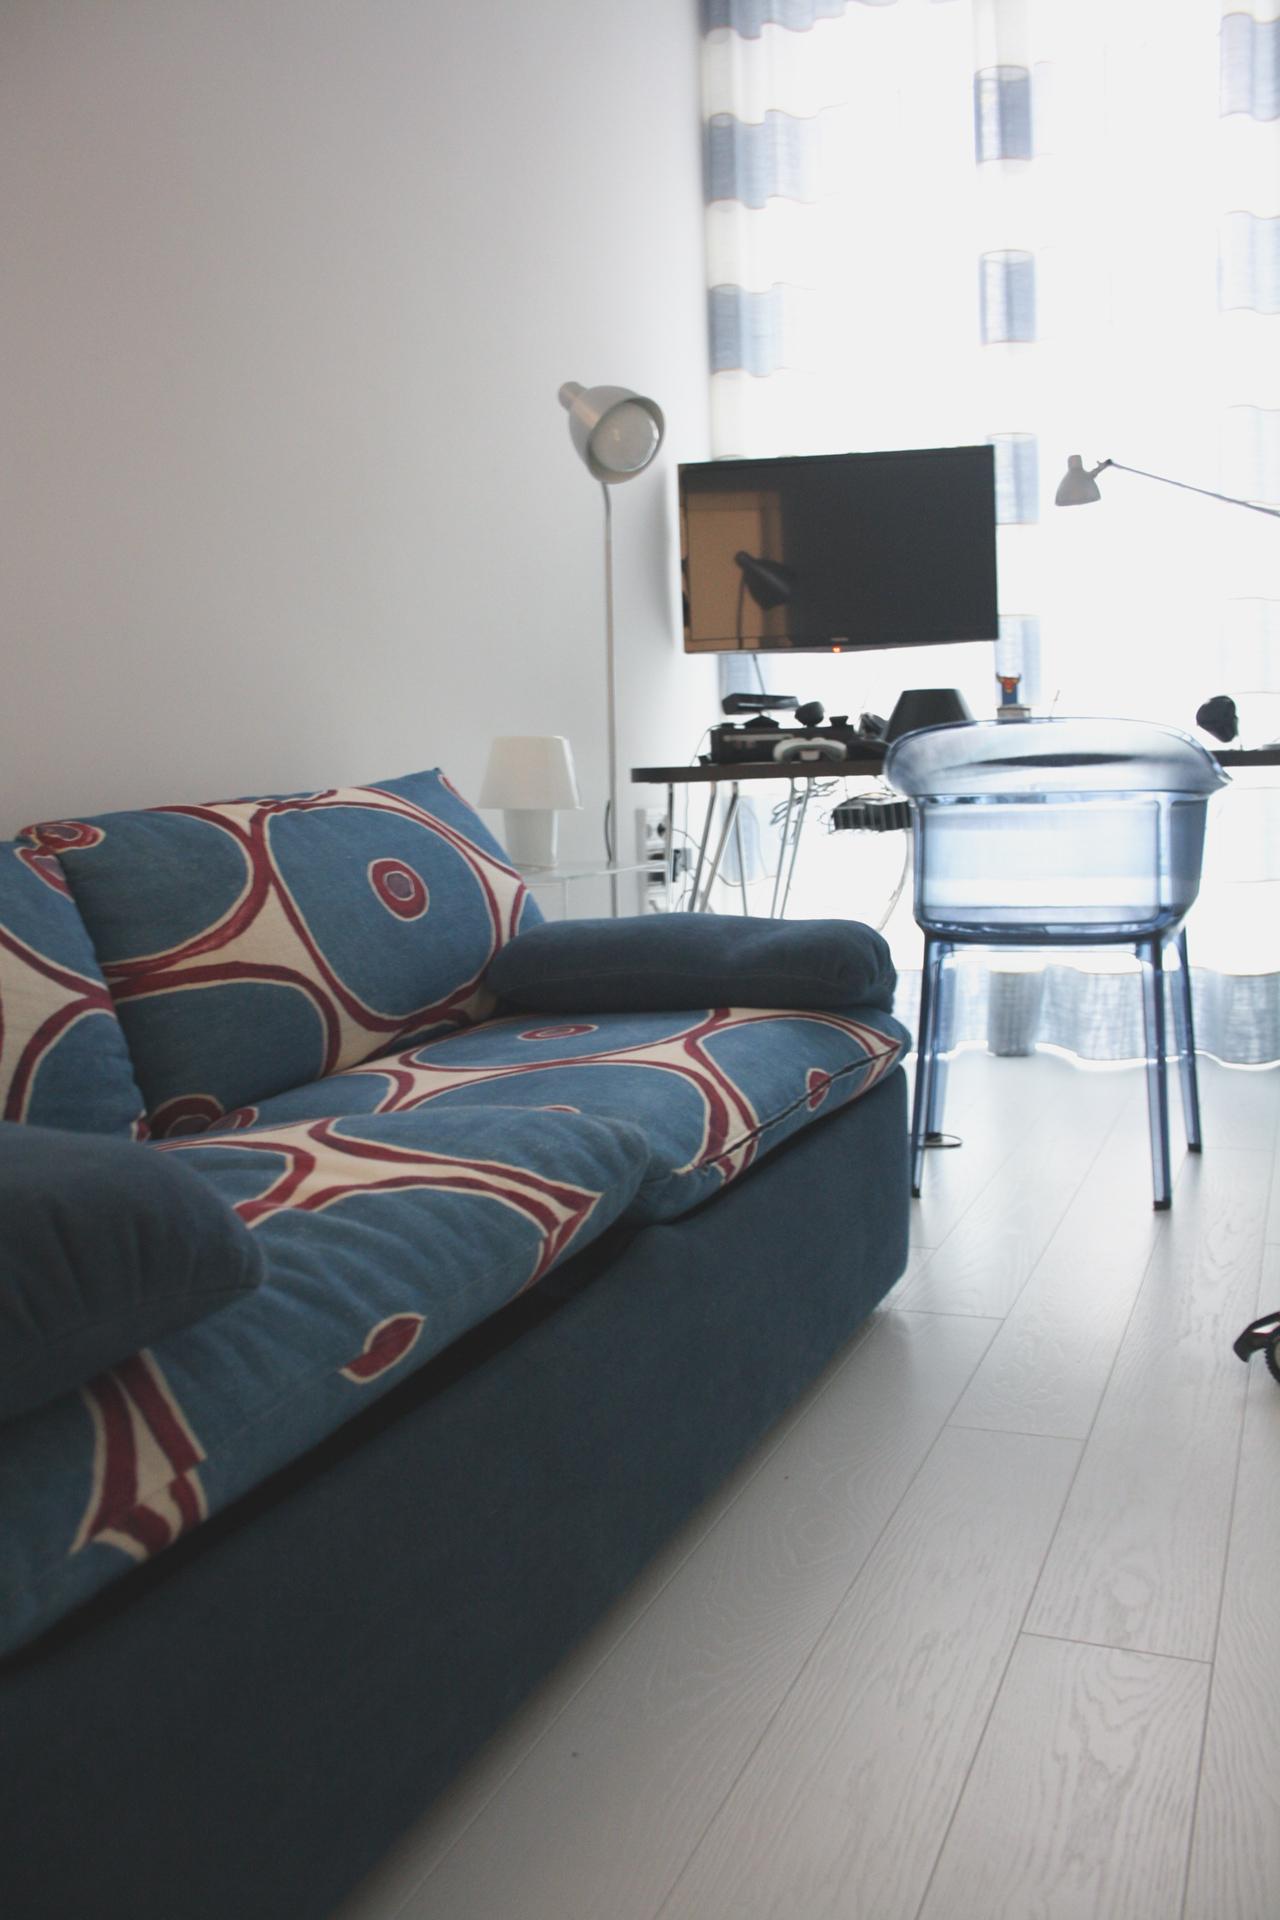 Ristrutturazione Casa | Do Up Home